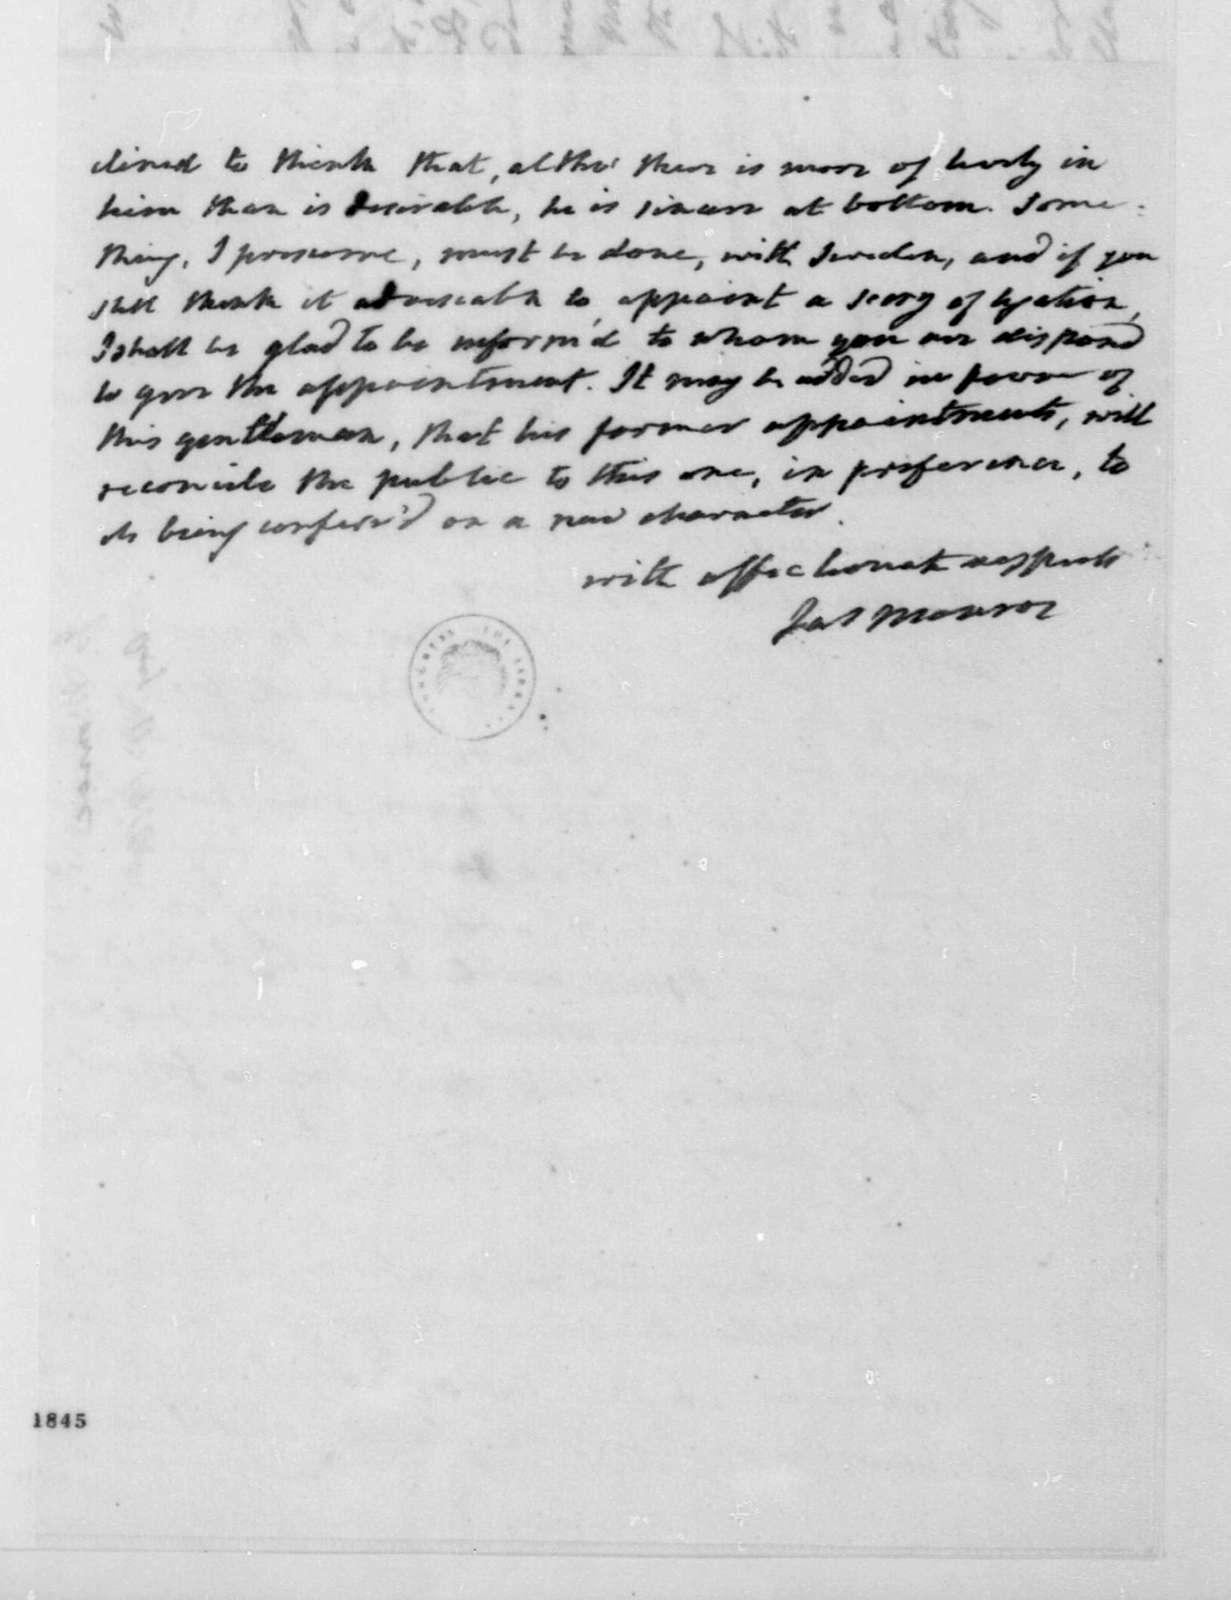 James Monroe to James Madison, August 11, 1816.